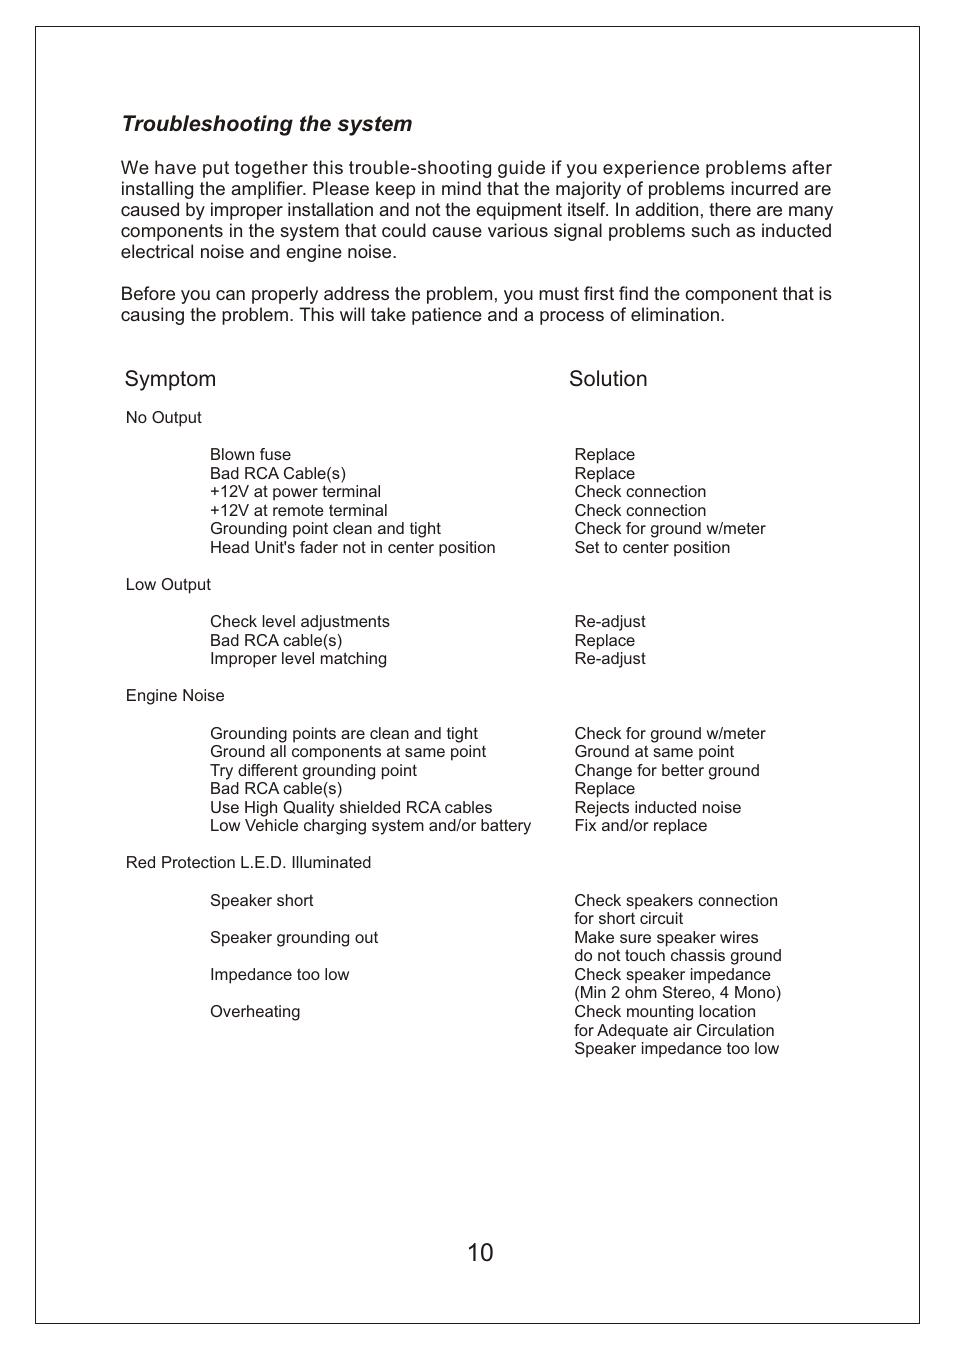 Troubleshooting the system, Symptom solution | Bassworx BA3000 1D